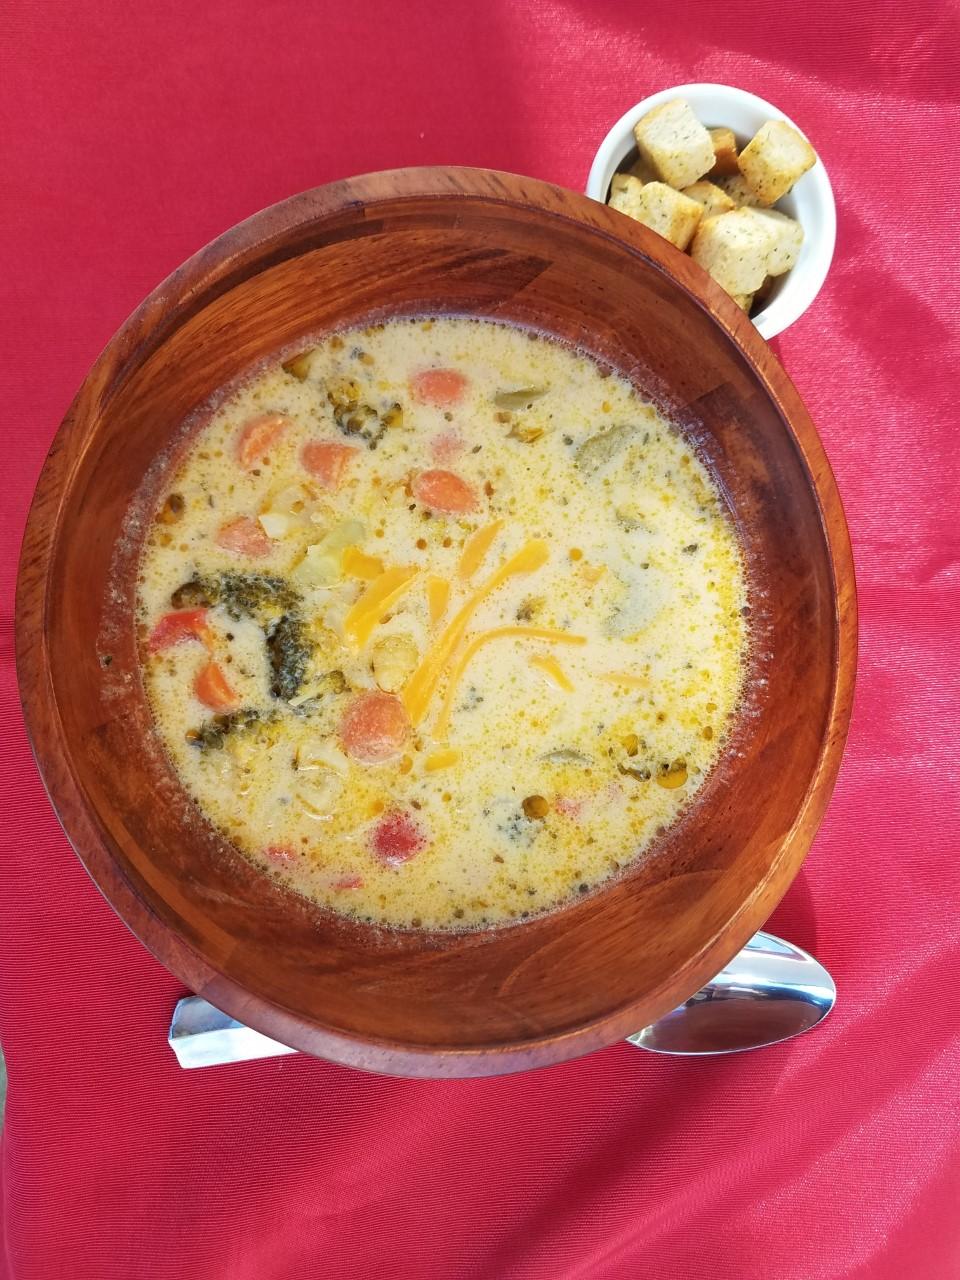 Cheesy Vegetable Soup I Liz Dalton 'Lizzie'